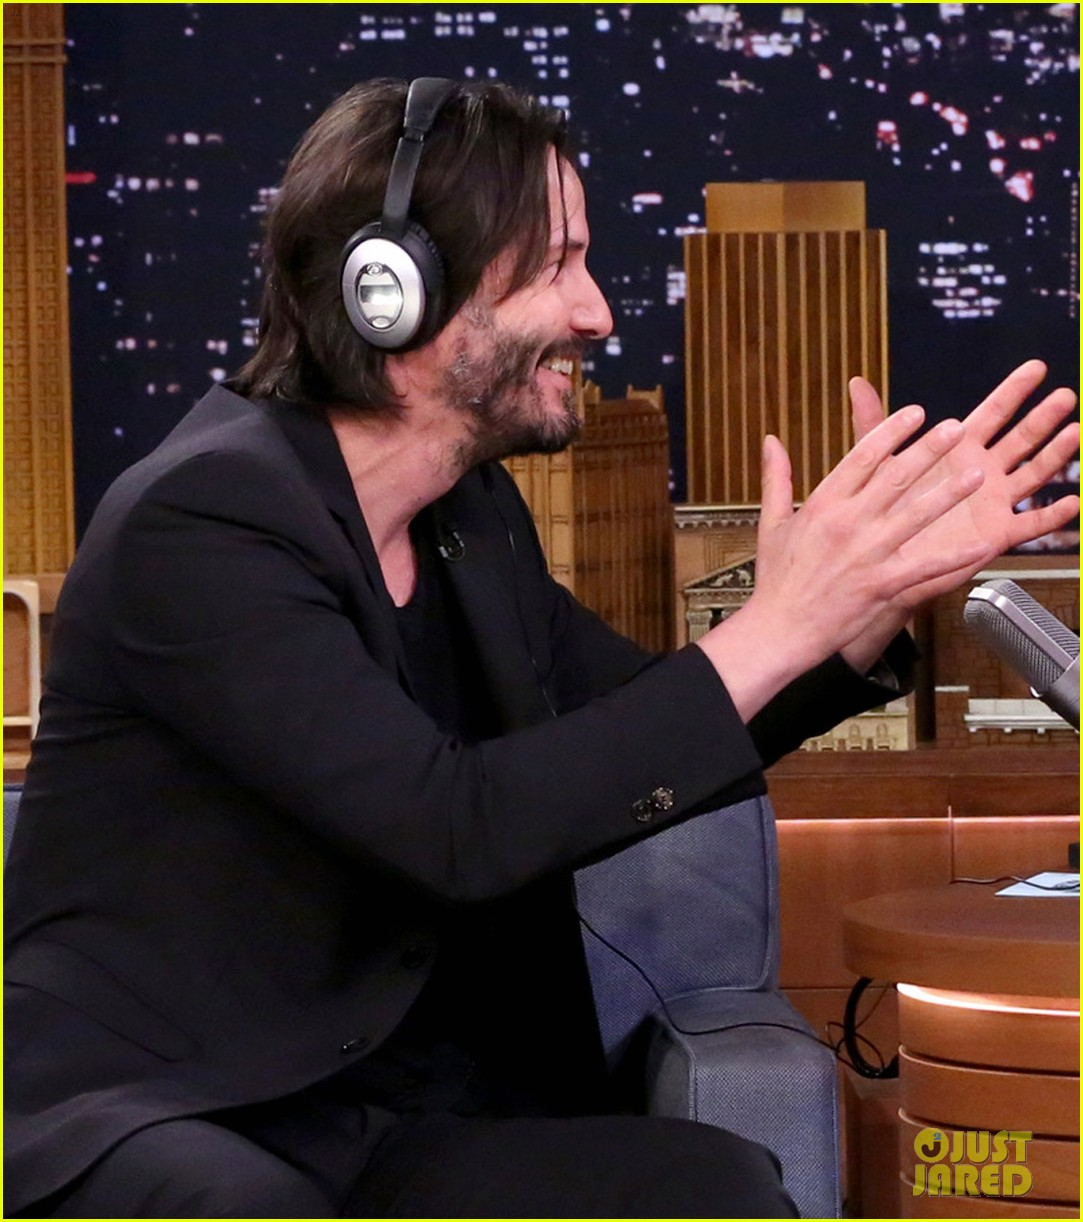 Keanu Reeves Wedding Ring Jimmy Fallon